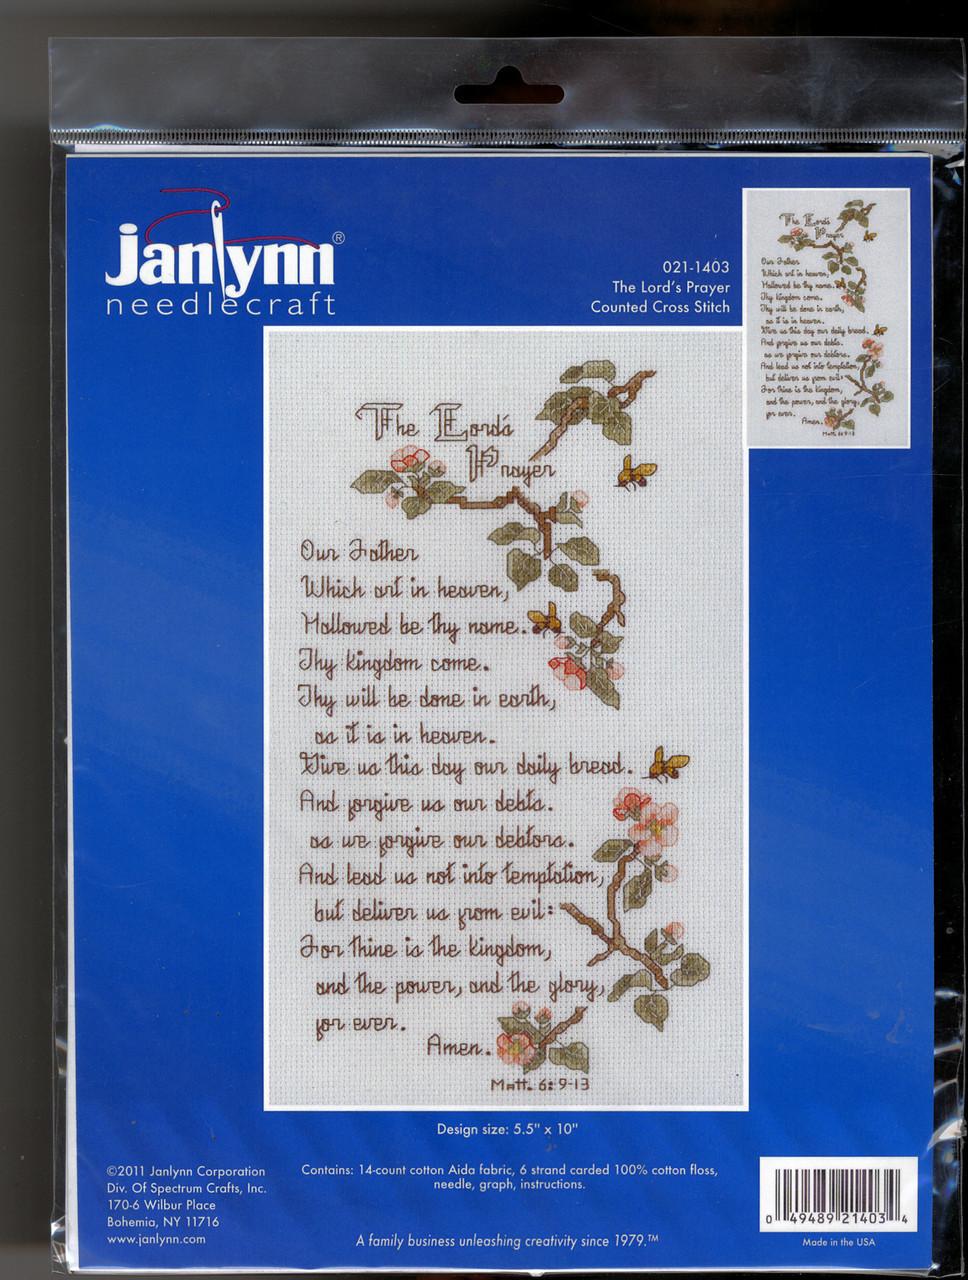 Janlynn - The Lord's Prayer